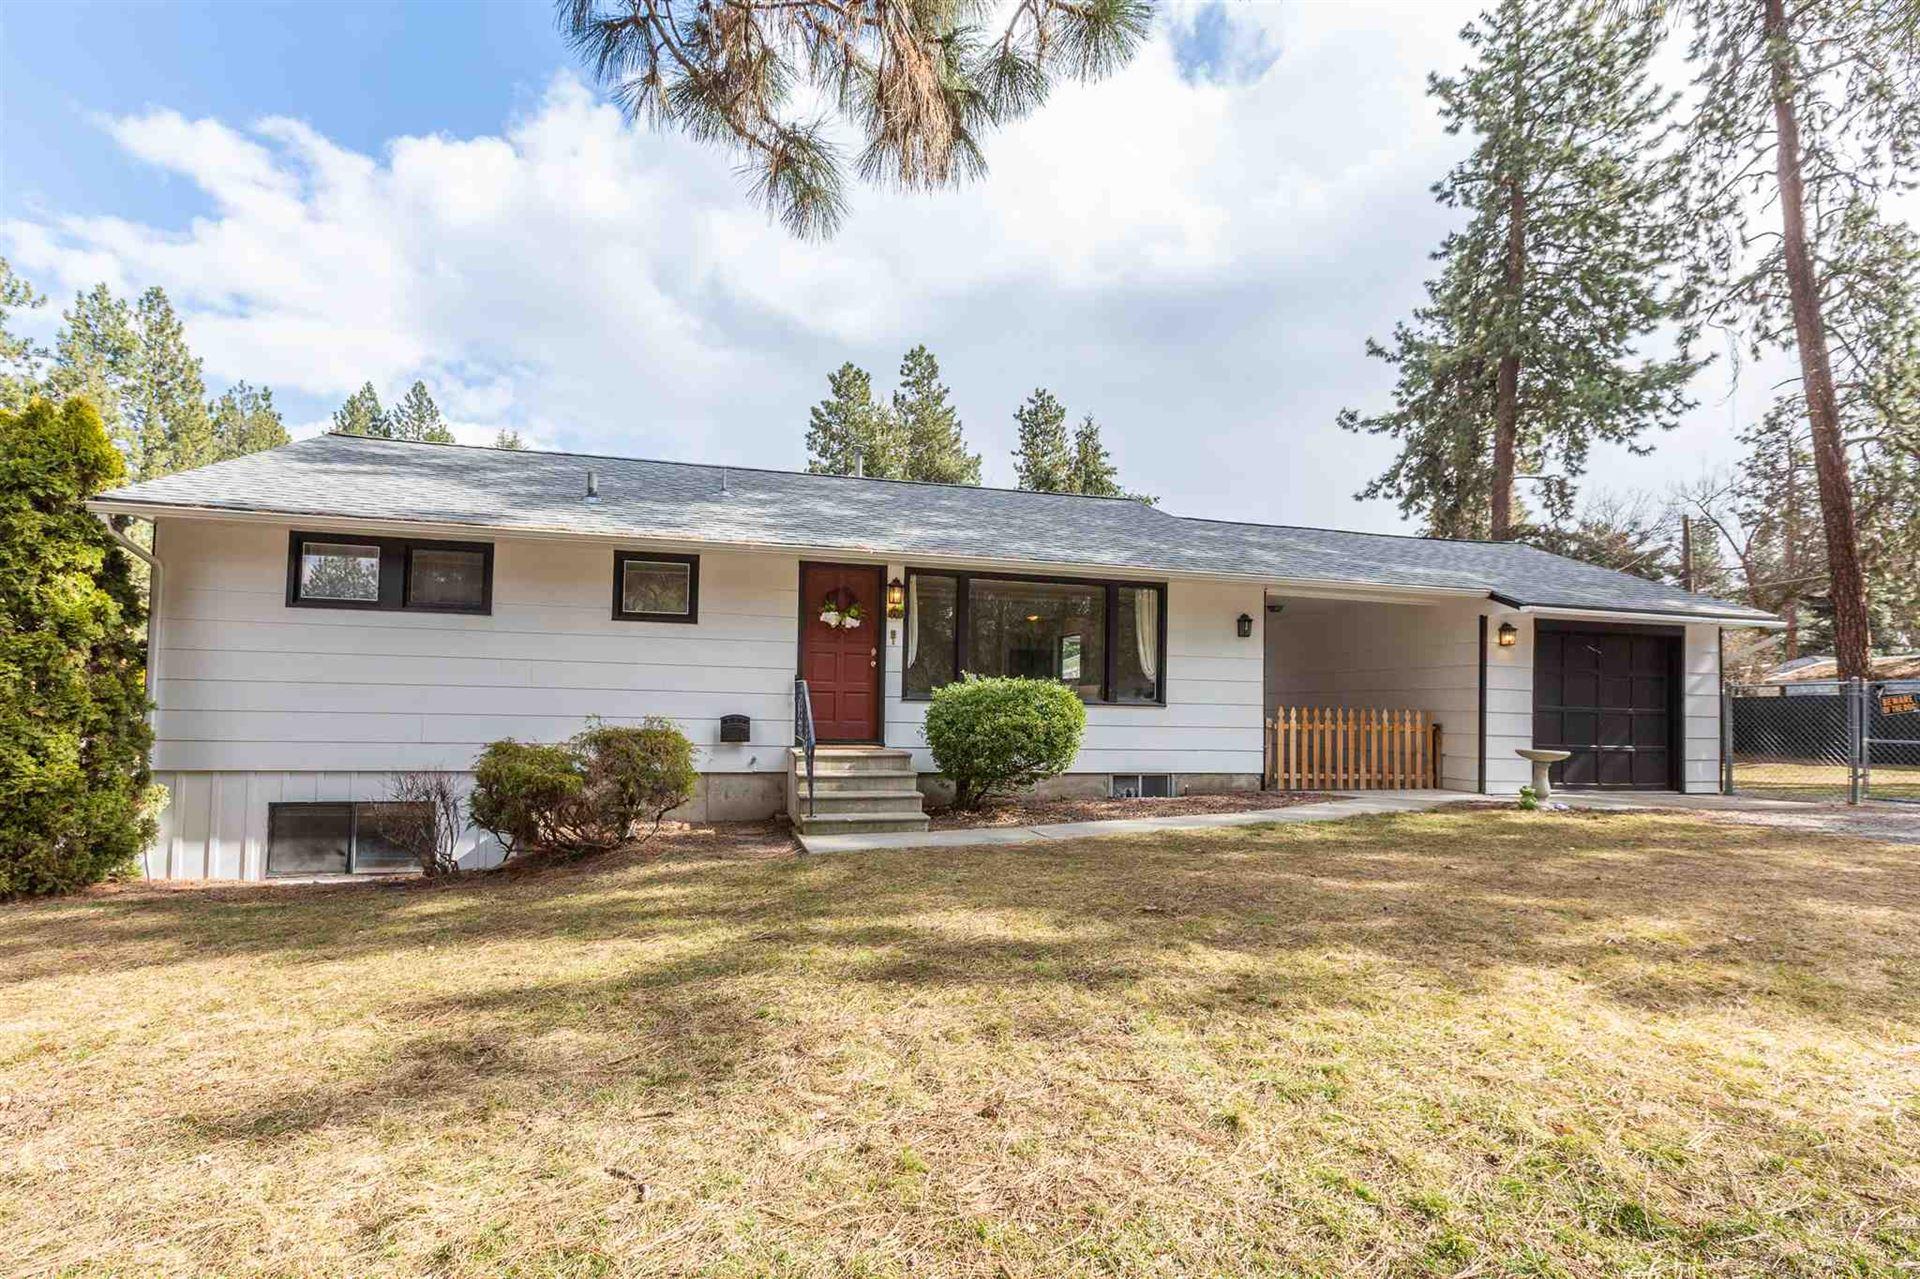 805 S Woodruff Rd, Spokane Valley, WA 99206 - #: 202112441